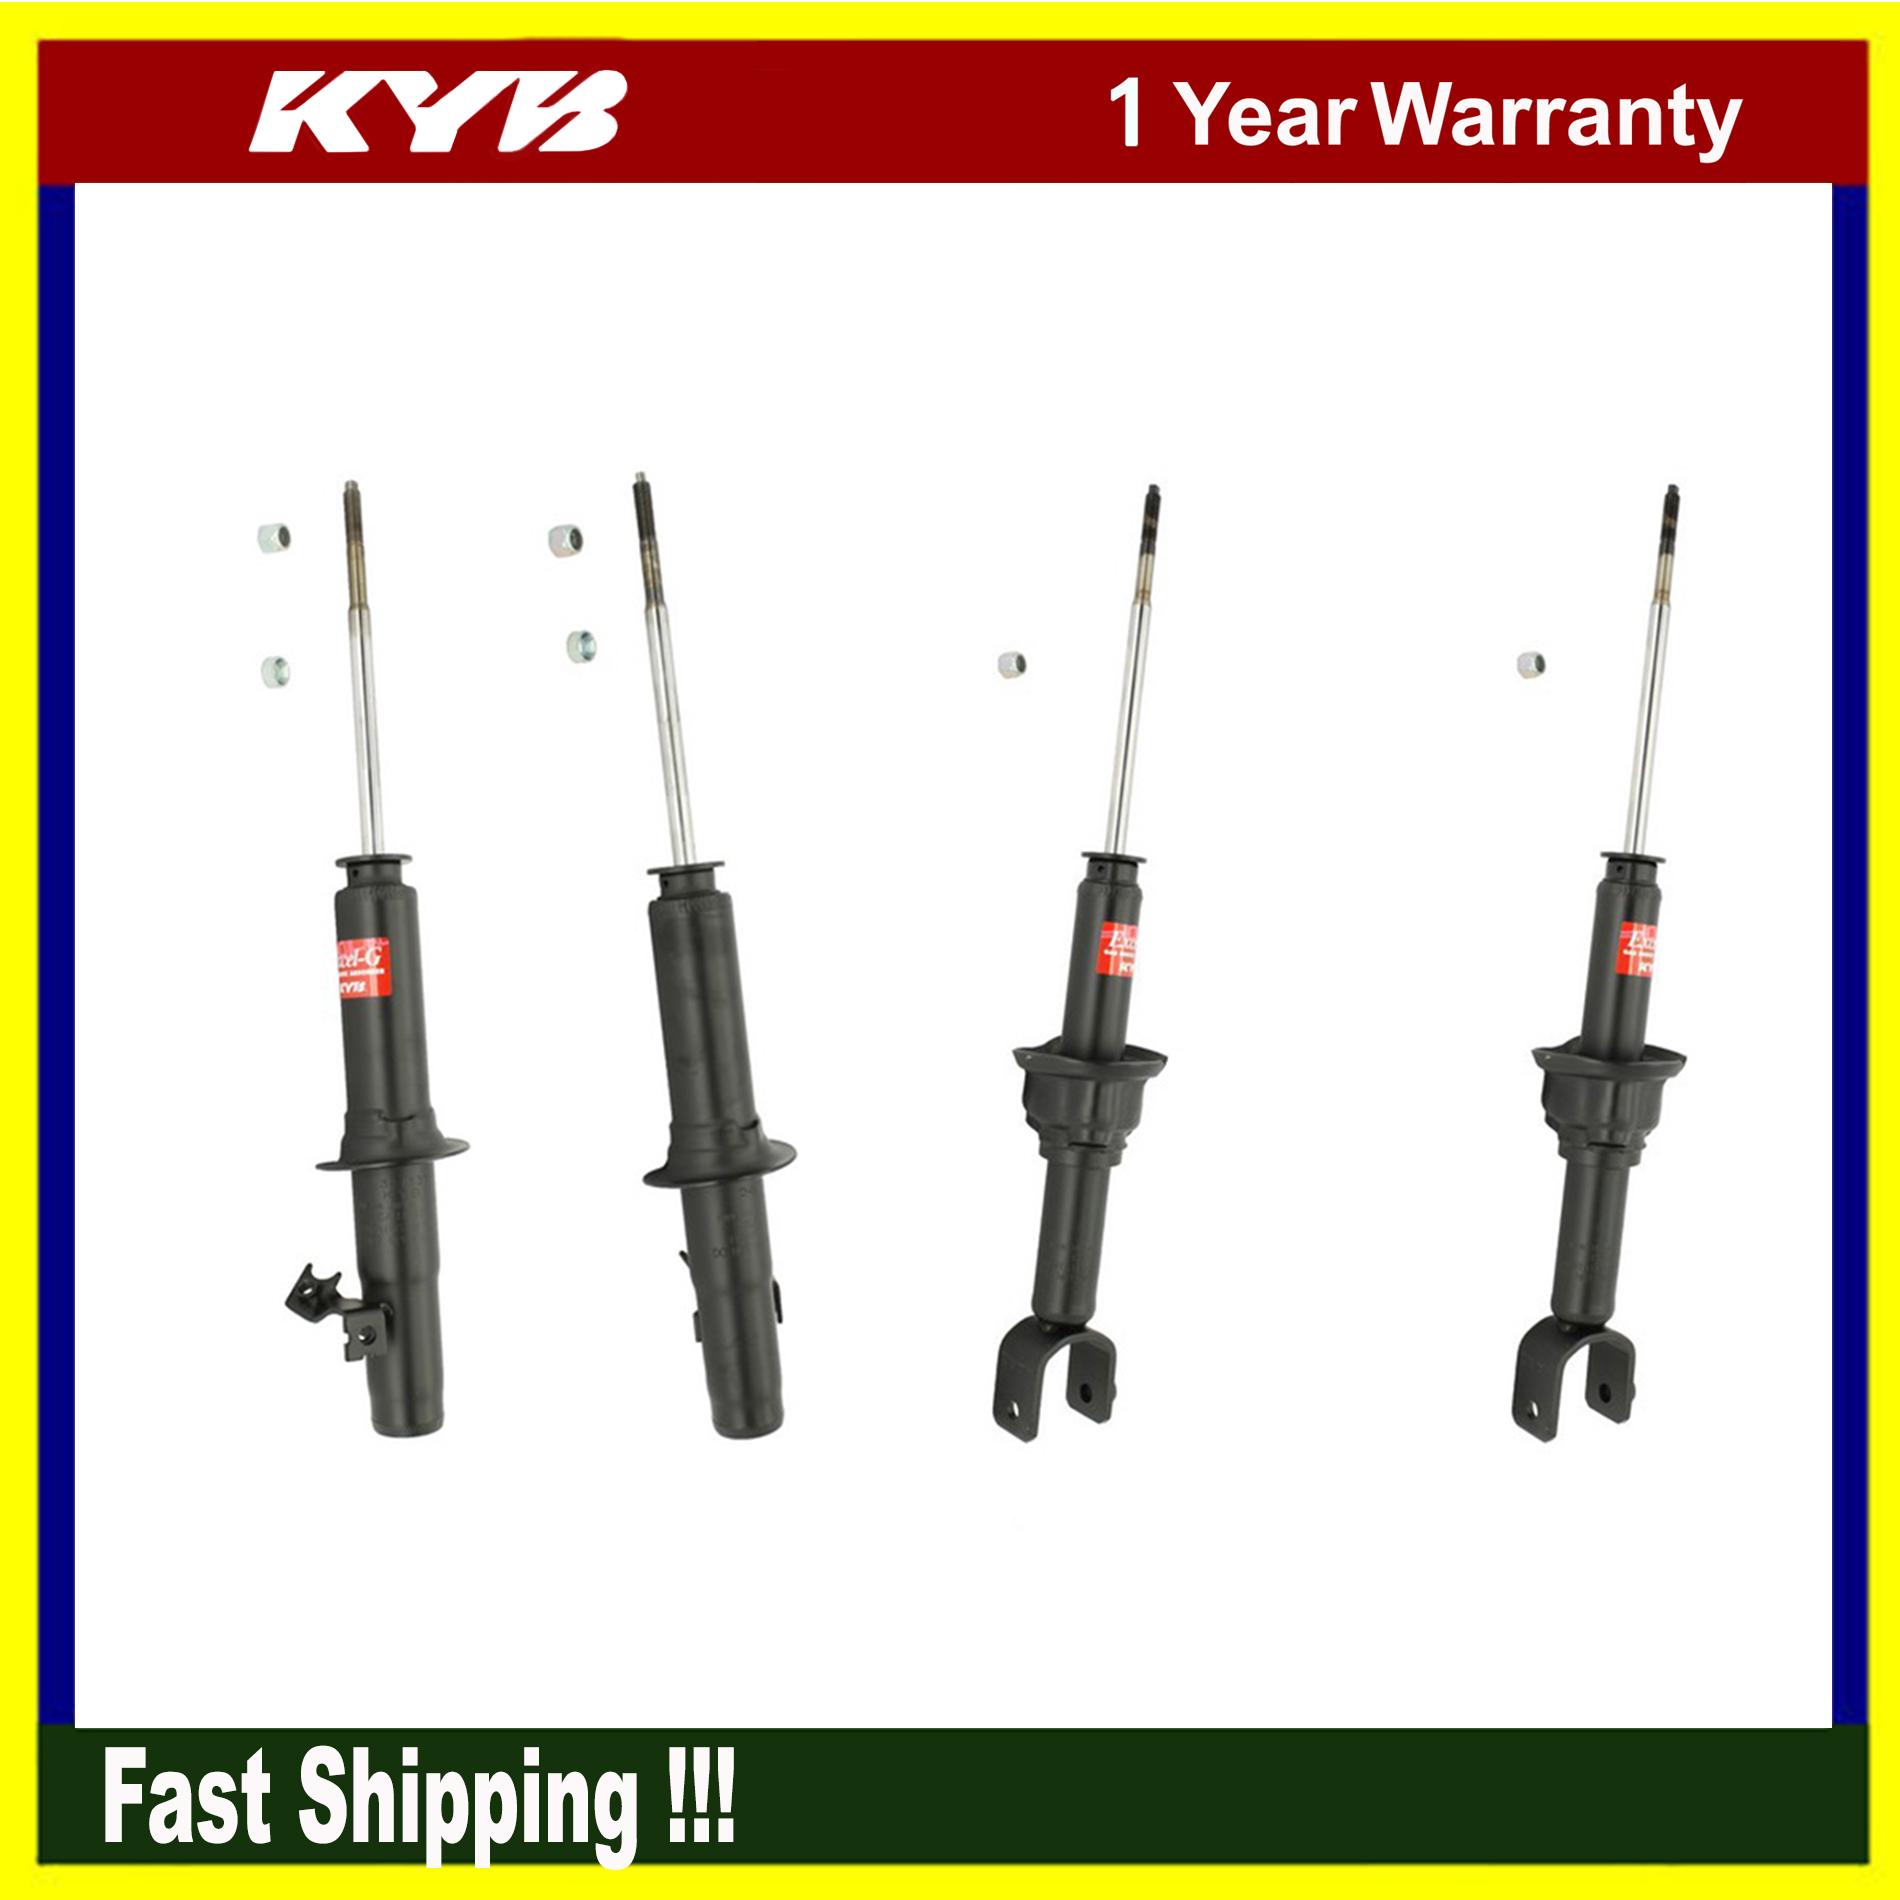 4 PCs KYB Suspension Struts Kits Fits 1997-2001 Acura